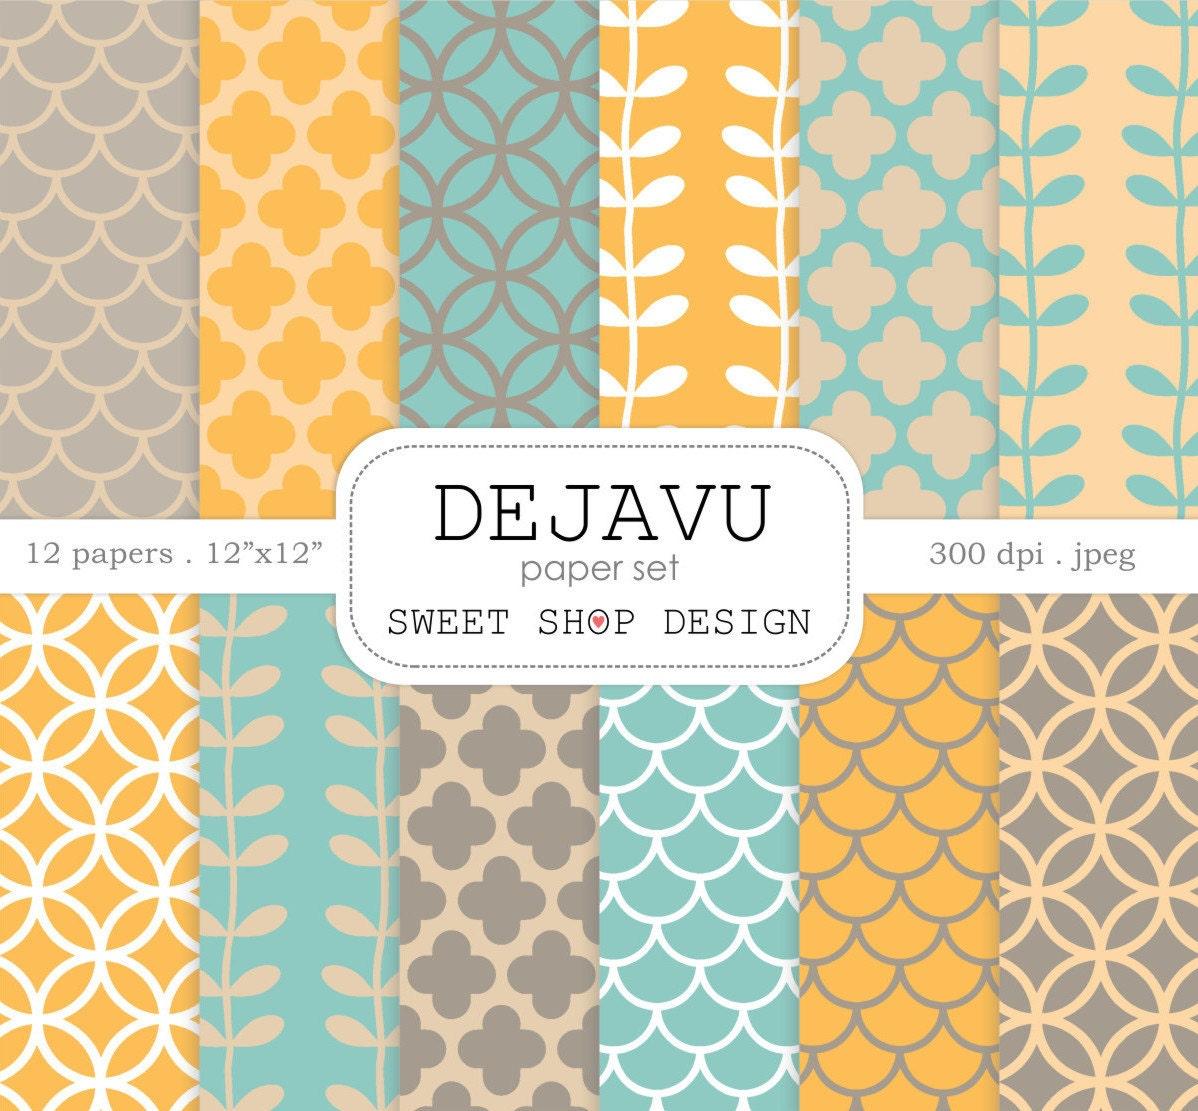 Digital Paper DEJAVU Printable Scrapbook Pack 12x12